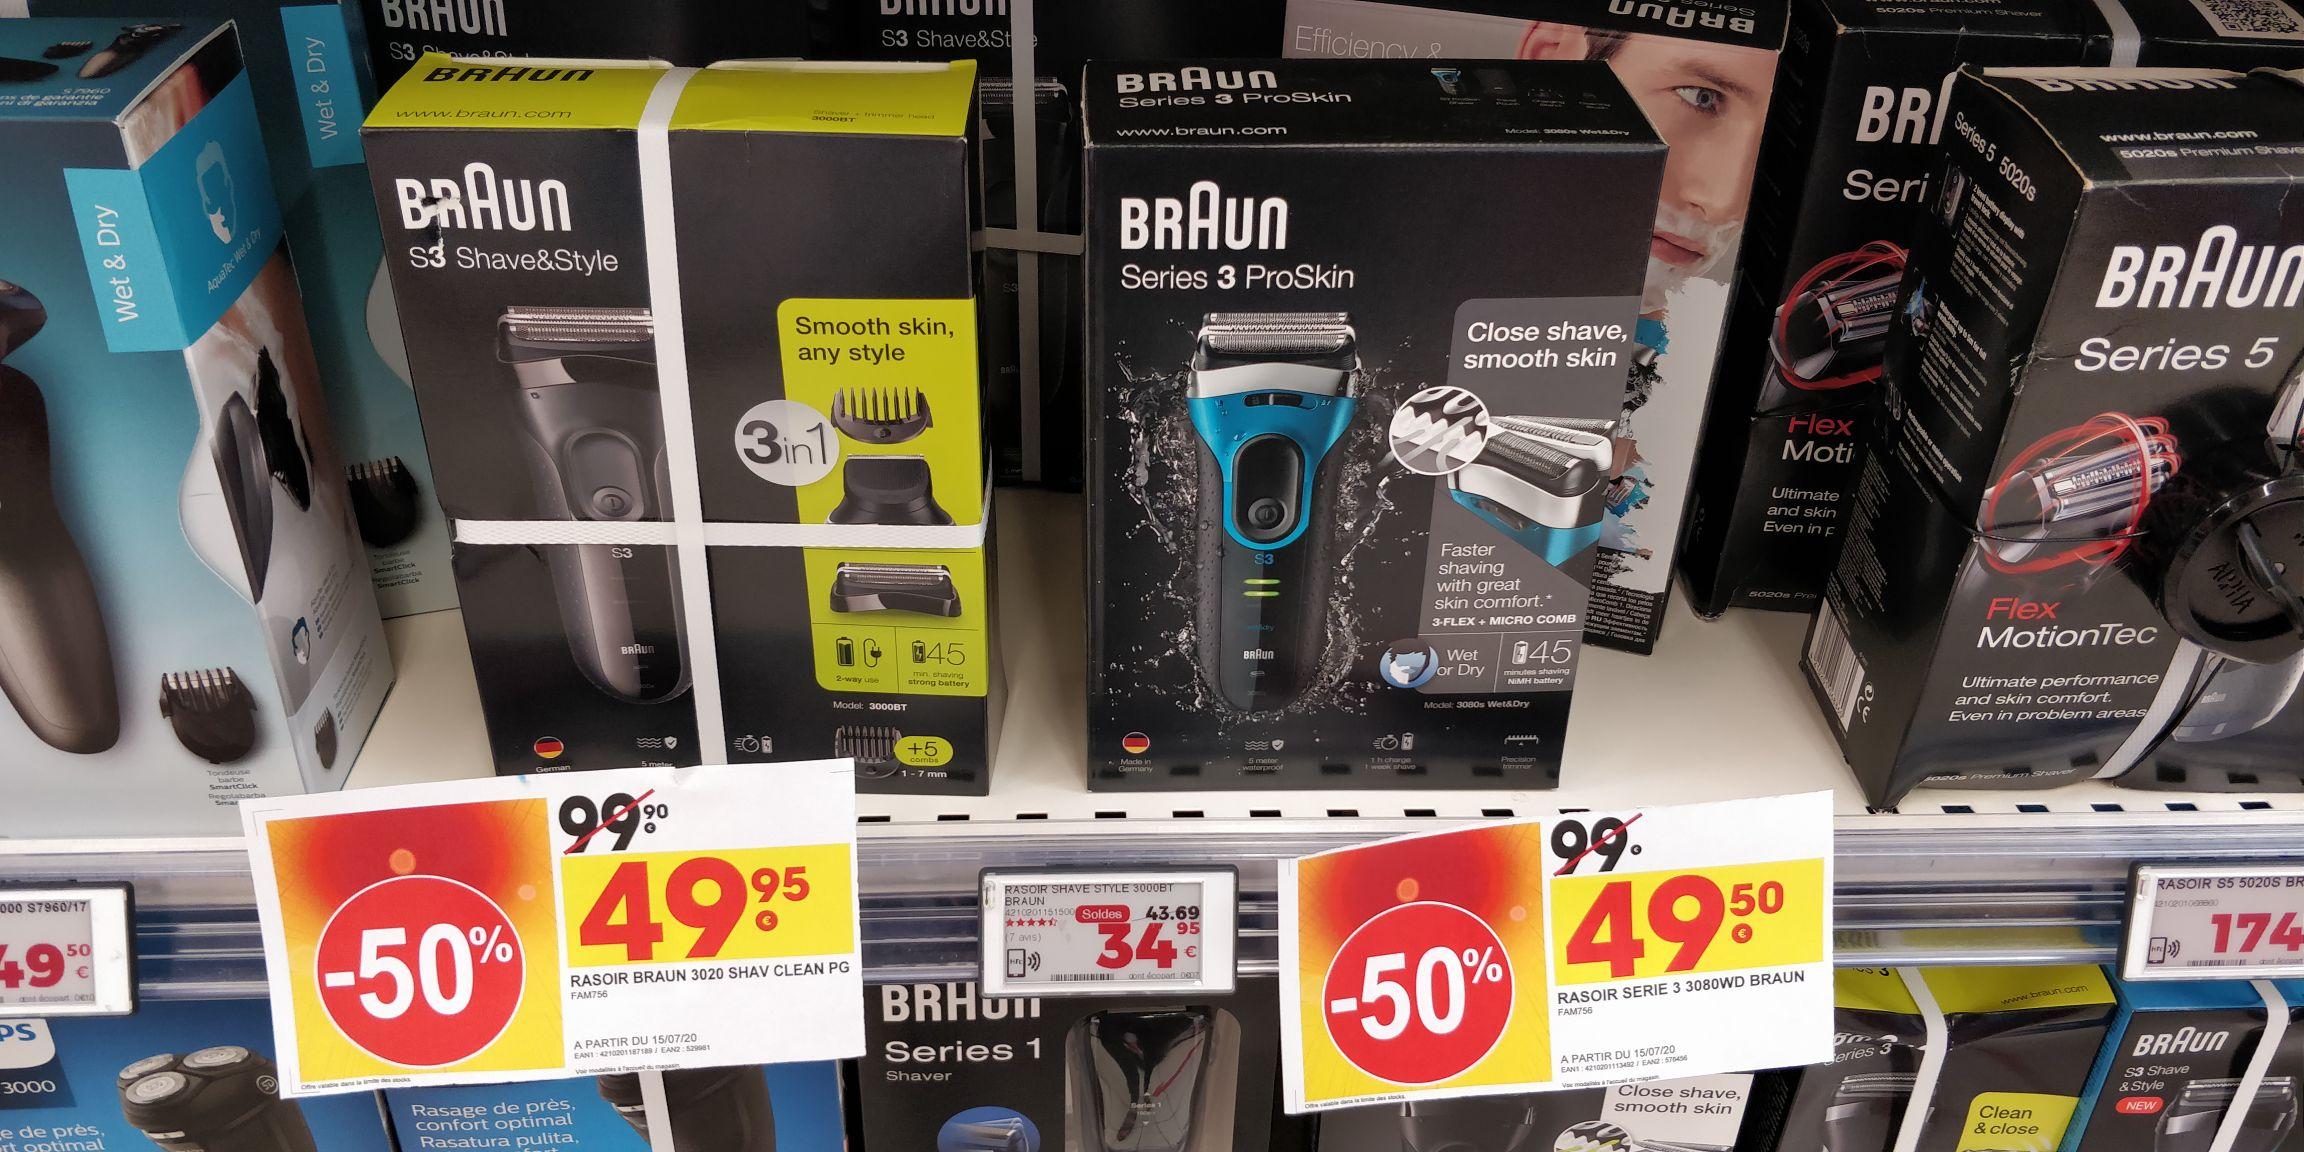 Rasoir électrique Braun 3020 SH1V CLEAN PG (Angers 49)